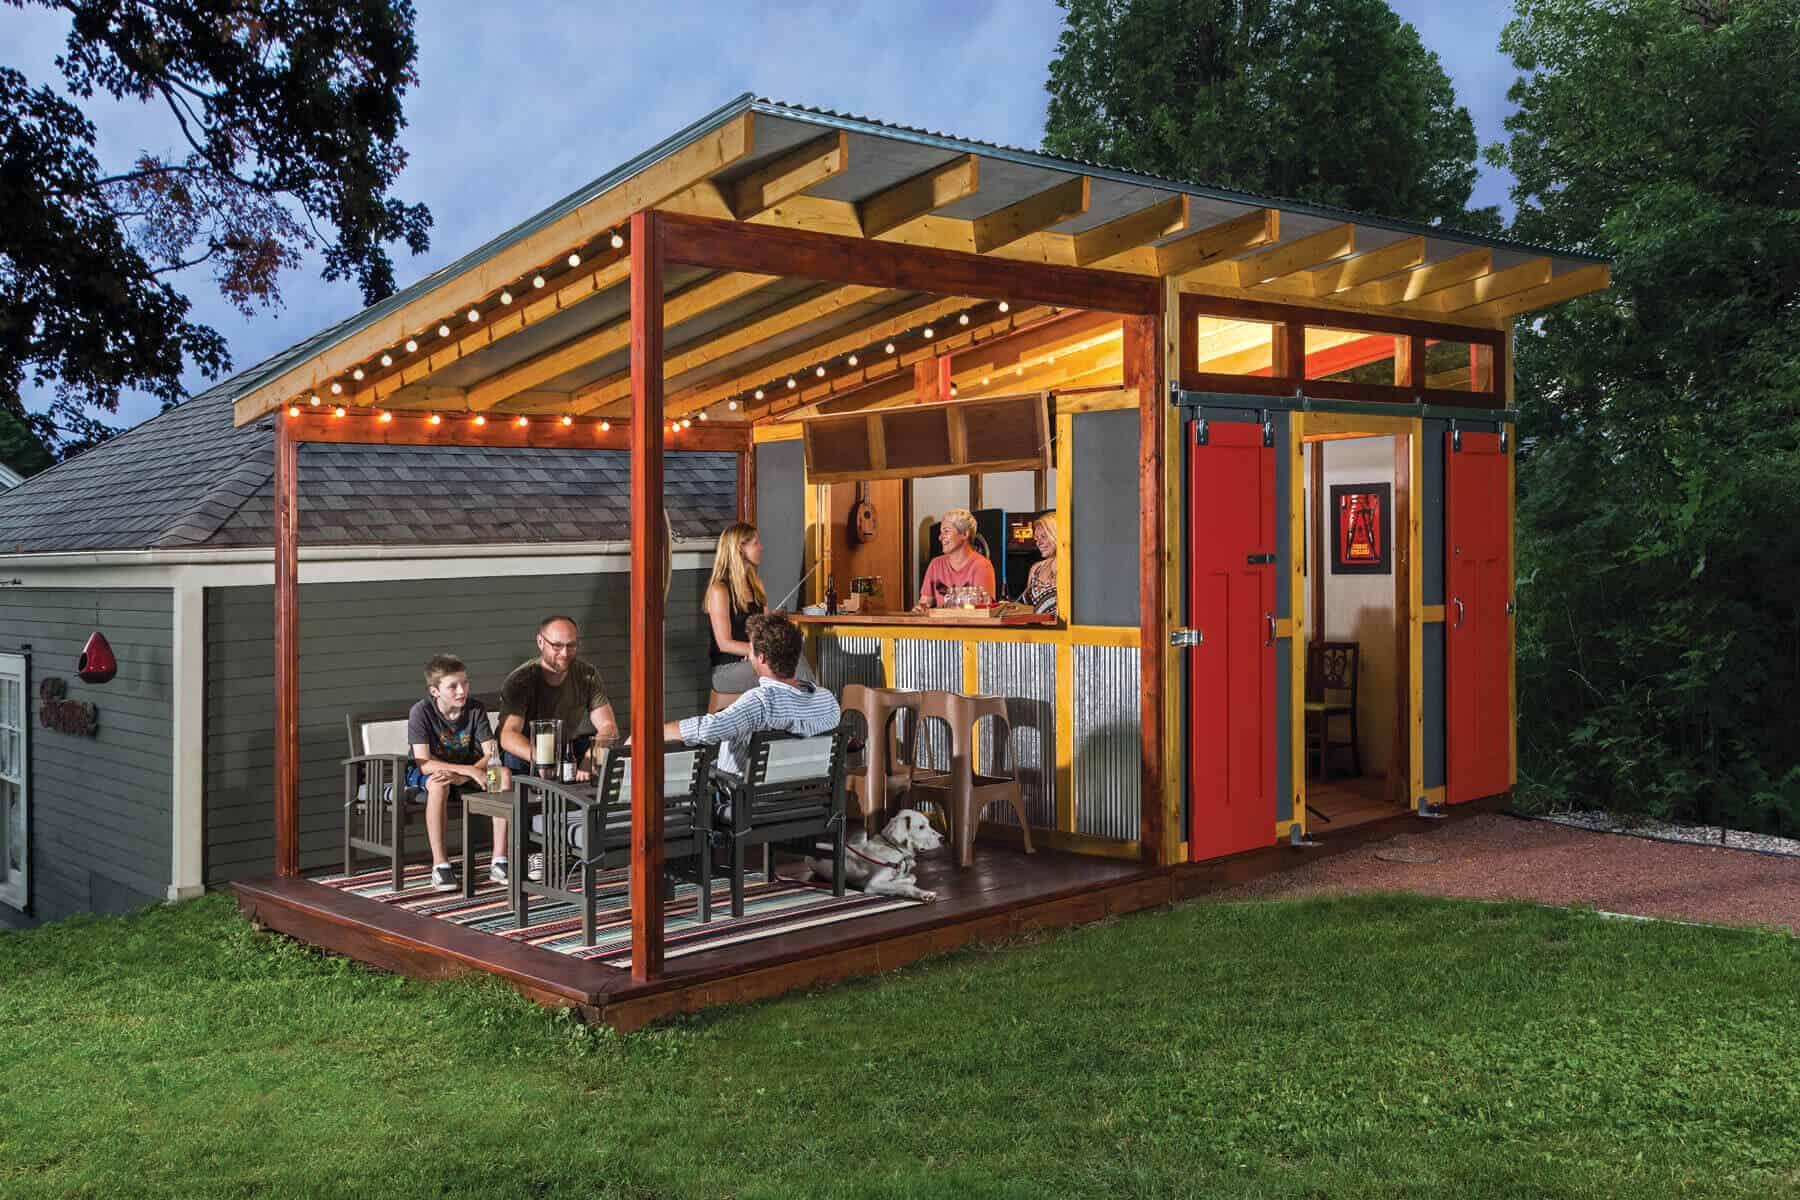 Inspiring and Smart Outdoor Bar Design Ideas - The ... on Backyard Lounge Area Ideas id=14483